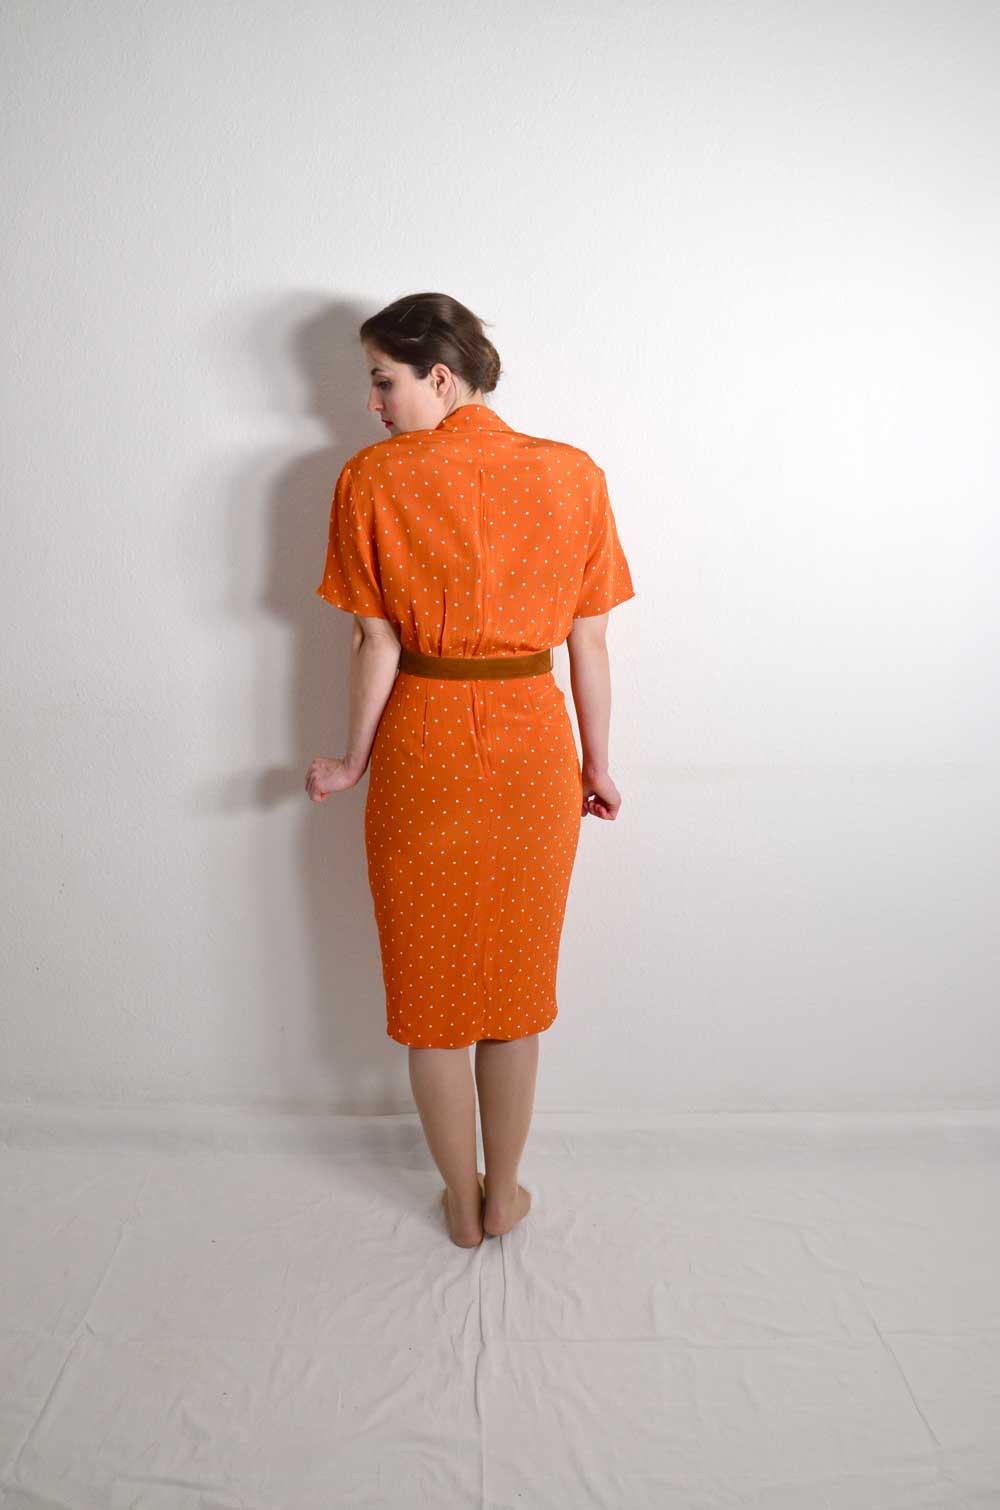 wallis vintage kleid orange minique oma klara. Black Bedroom Furniture Sets. Home Design Ideas